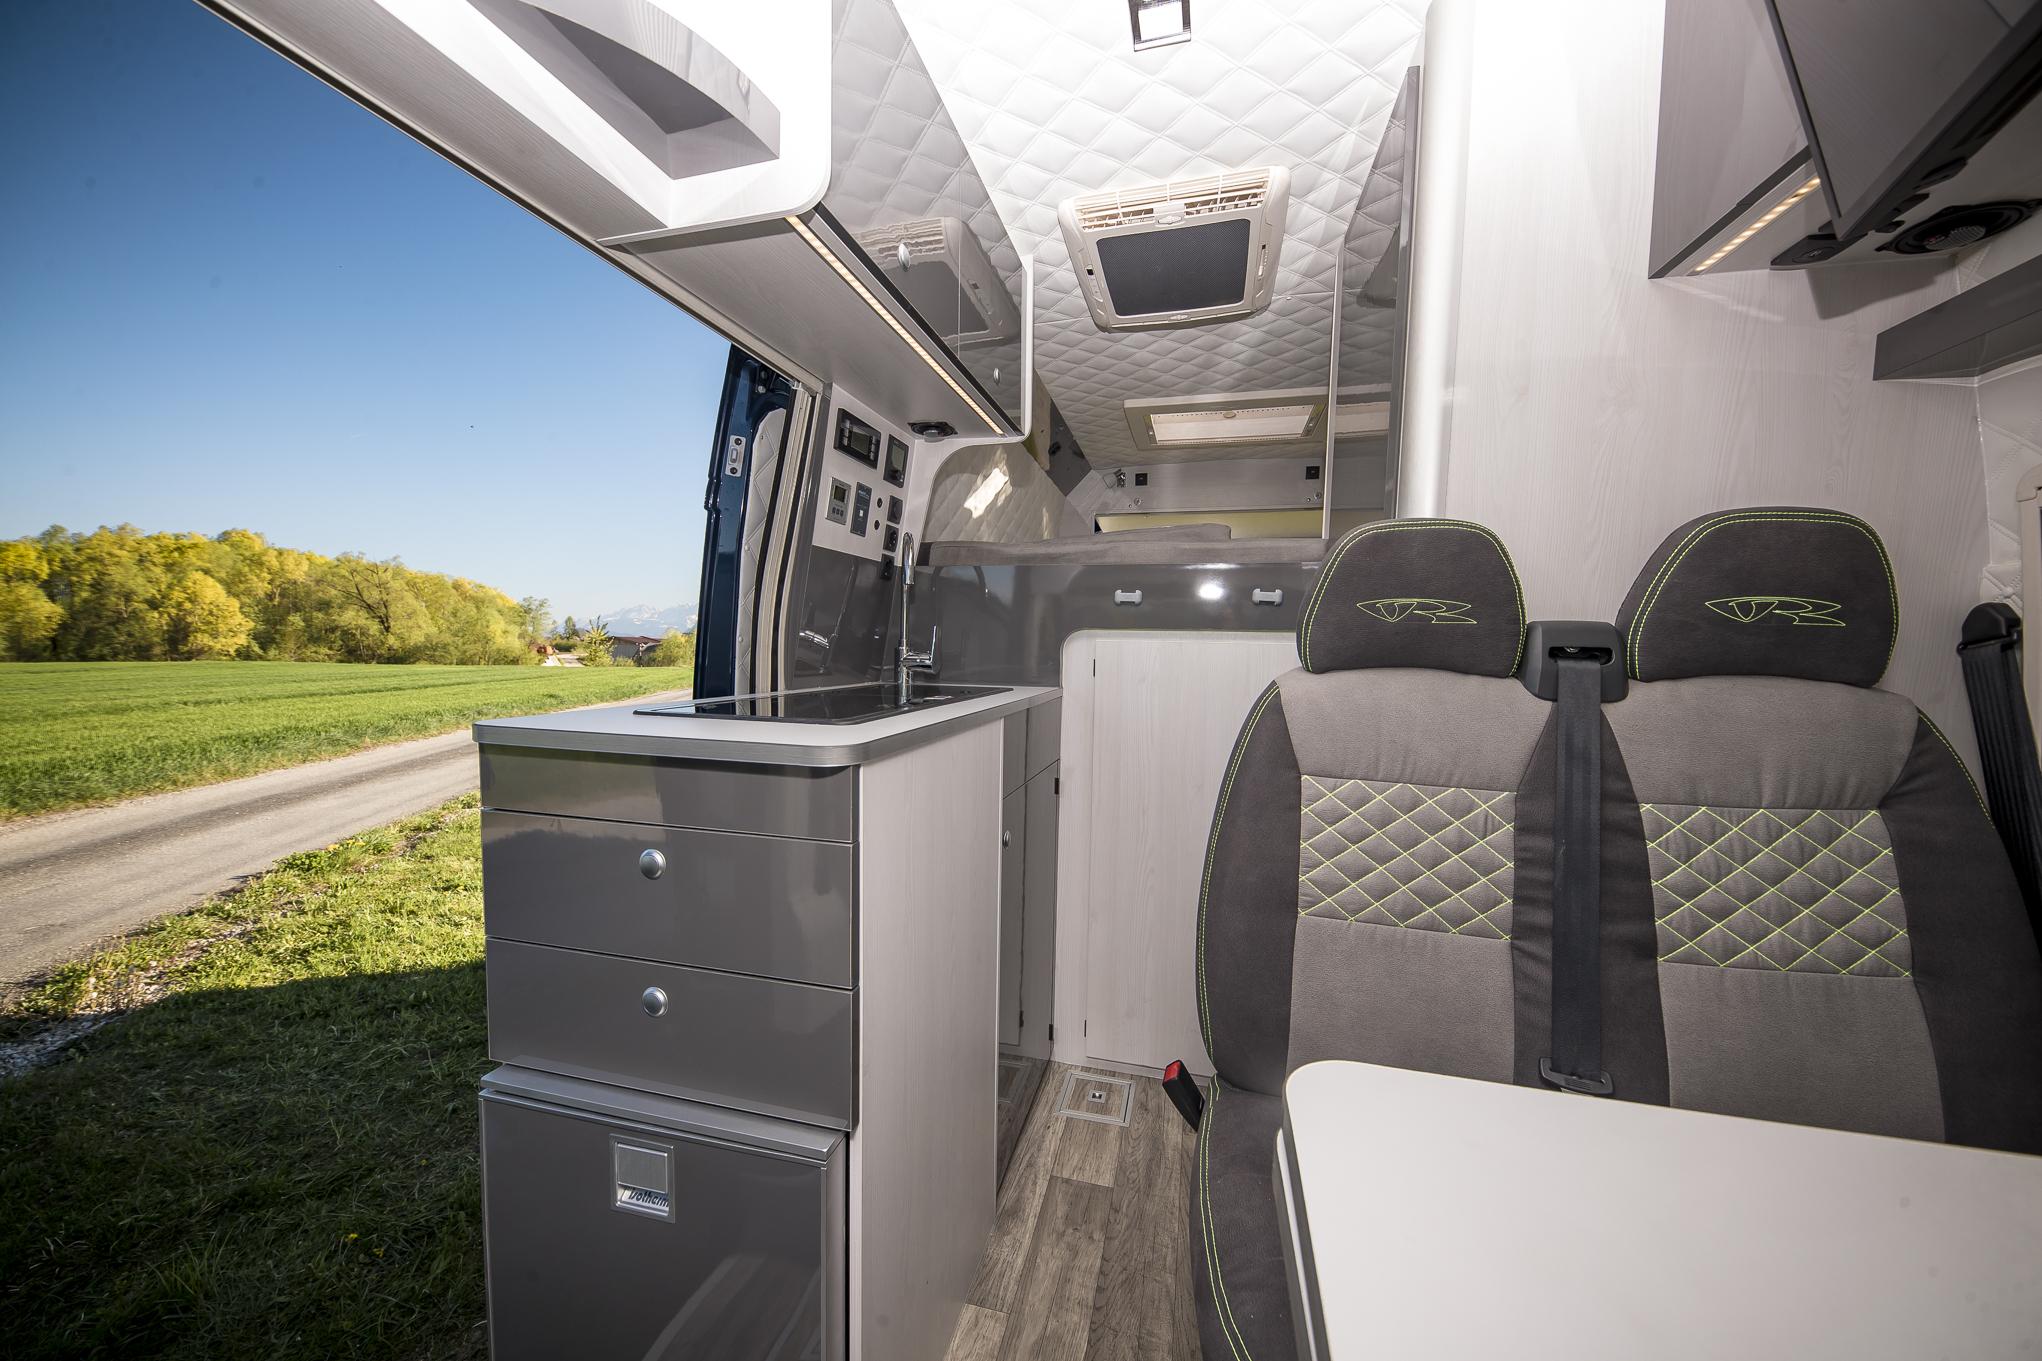 vrm vr doppelsitz 4 sitzer motorhomes interior luxus camper grey green limited edition seits s7 fenster s4 dometic